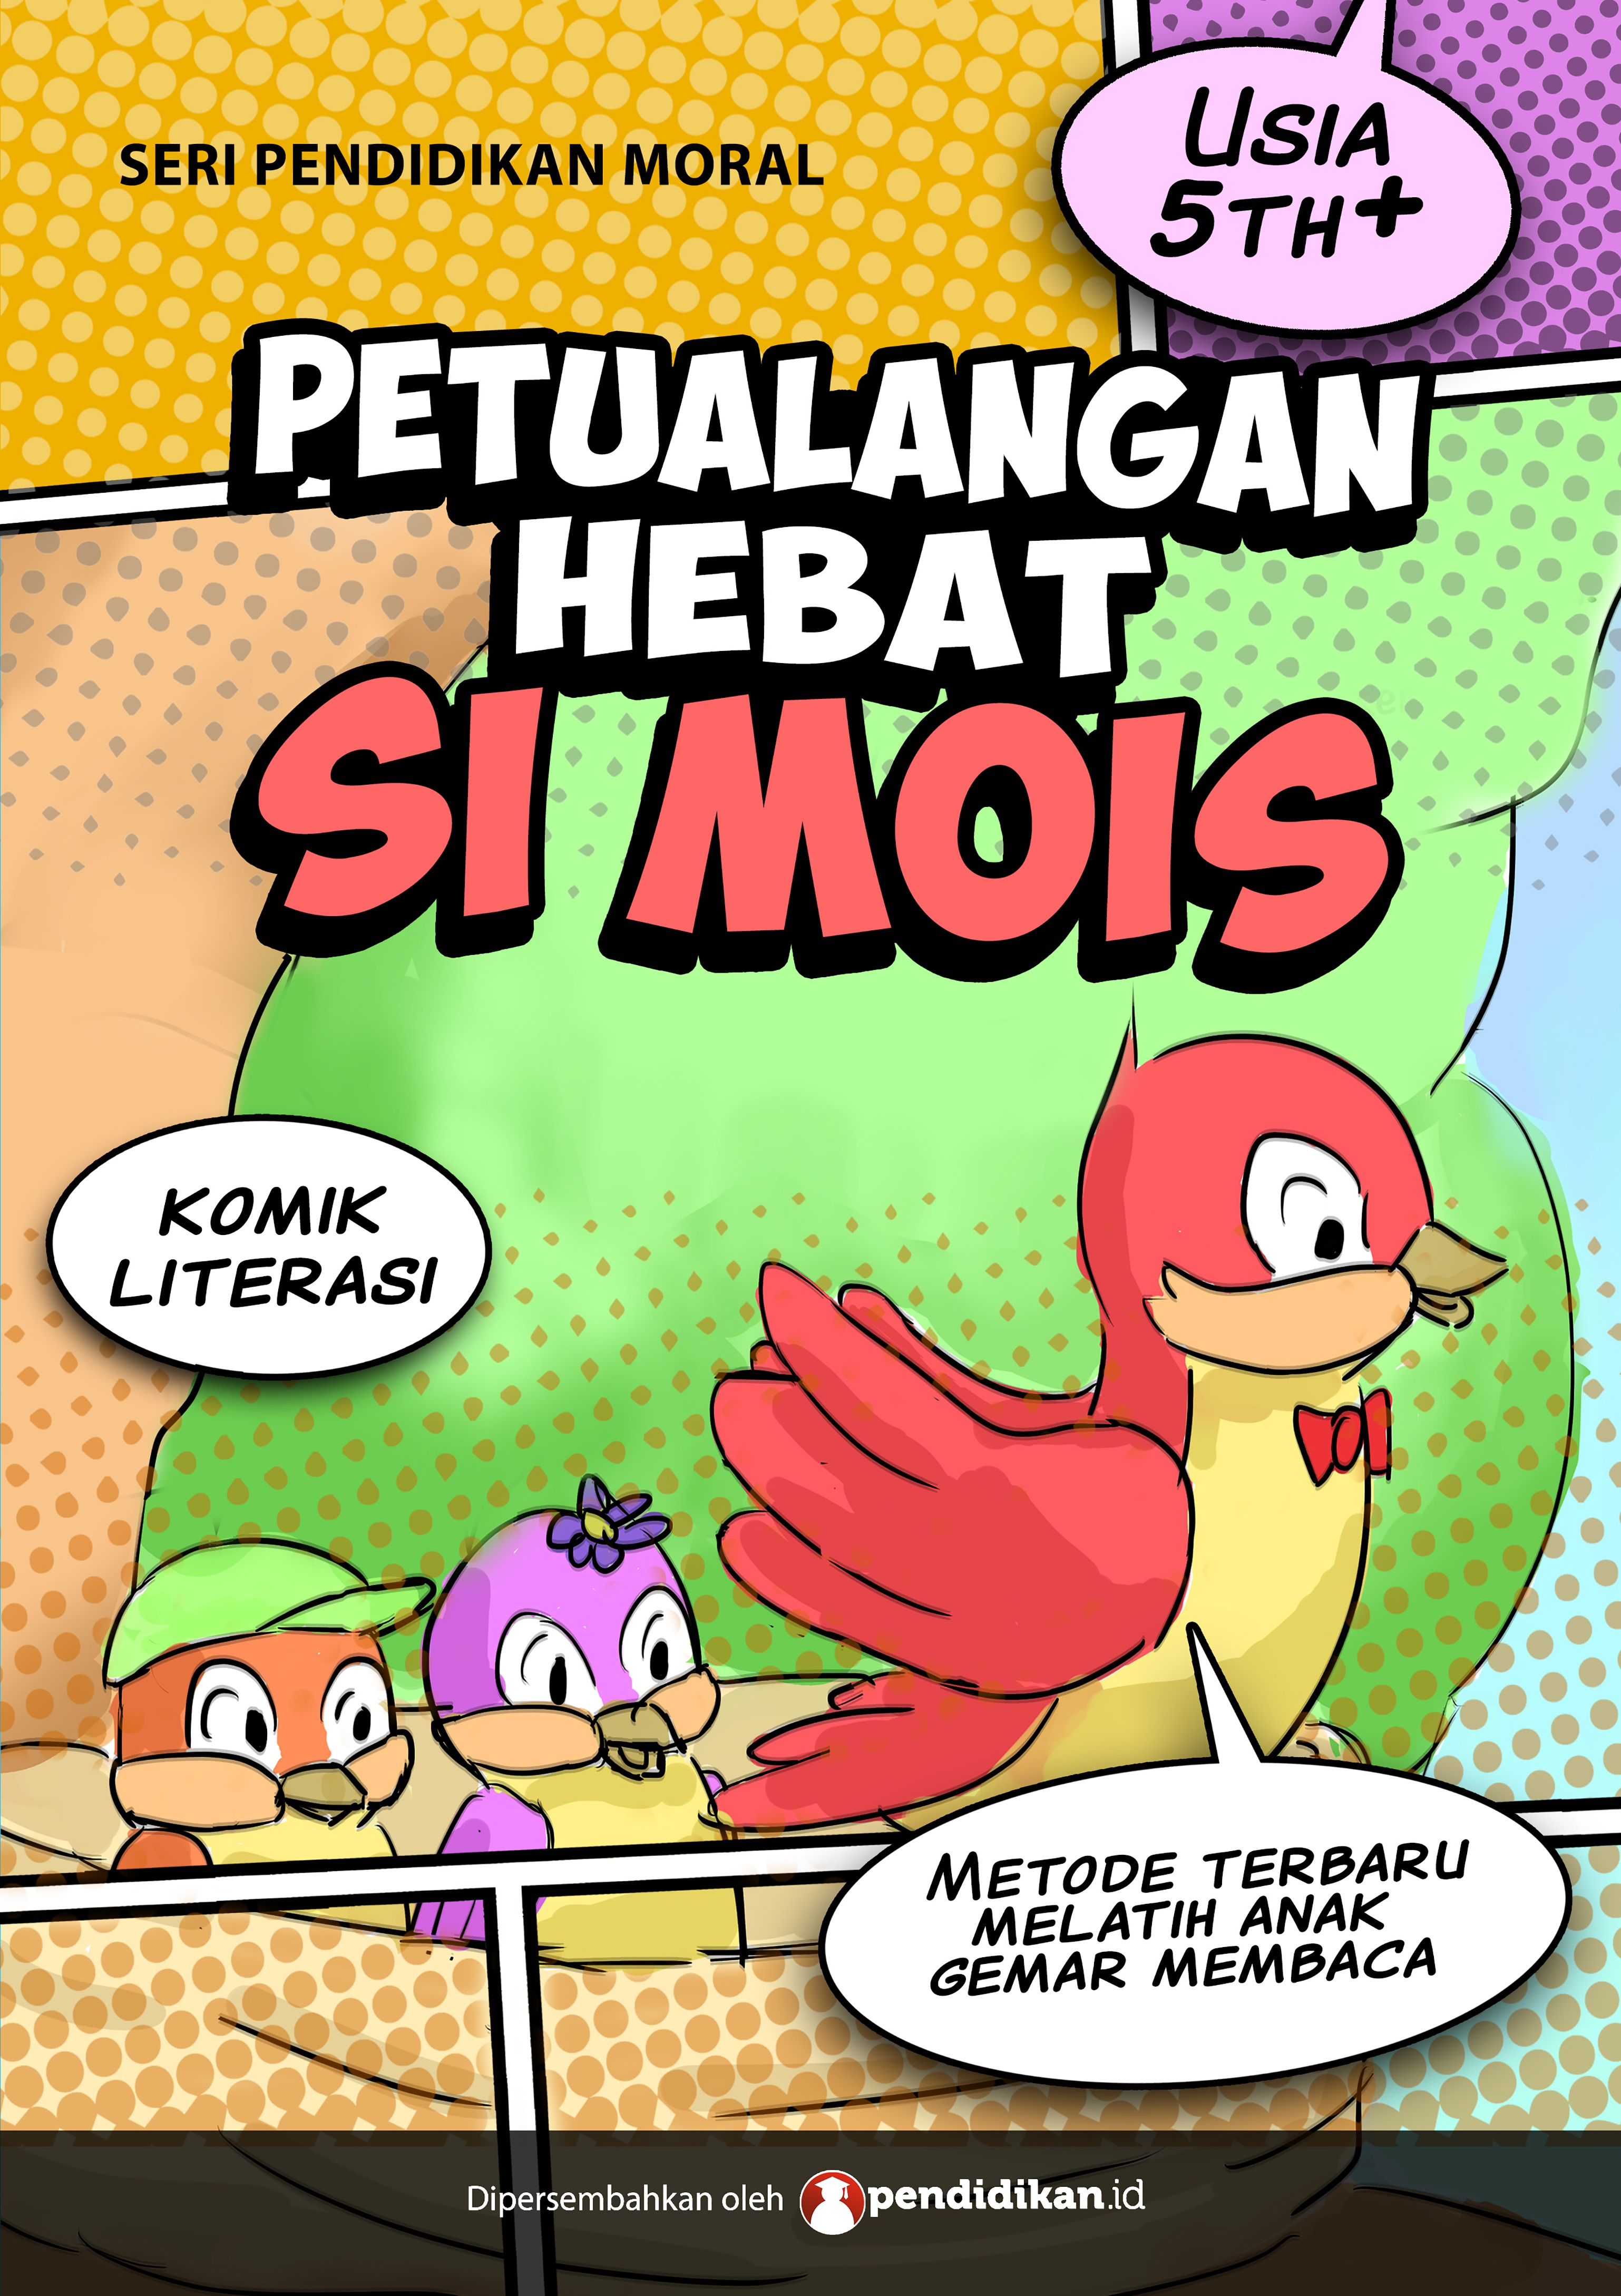 Petualangan Hebat Si Mois, Komik Literasi Menarik Sebagai Bahan Cerita untuk Si Kecil